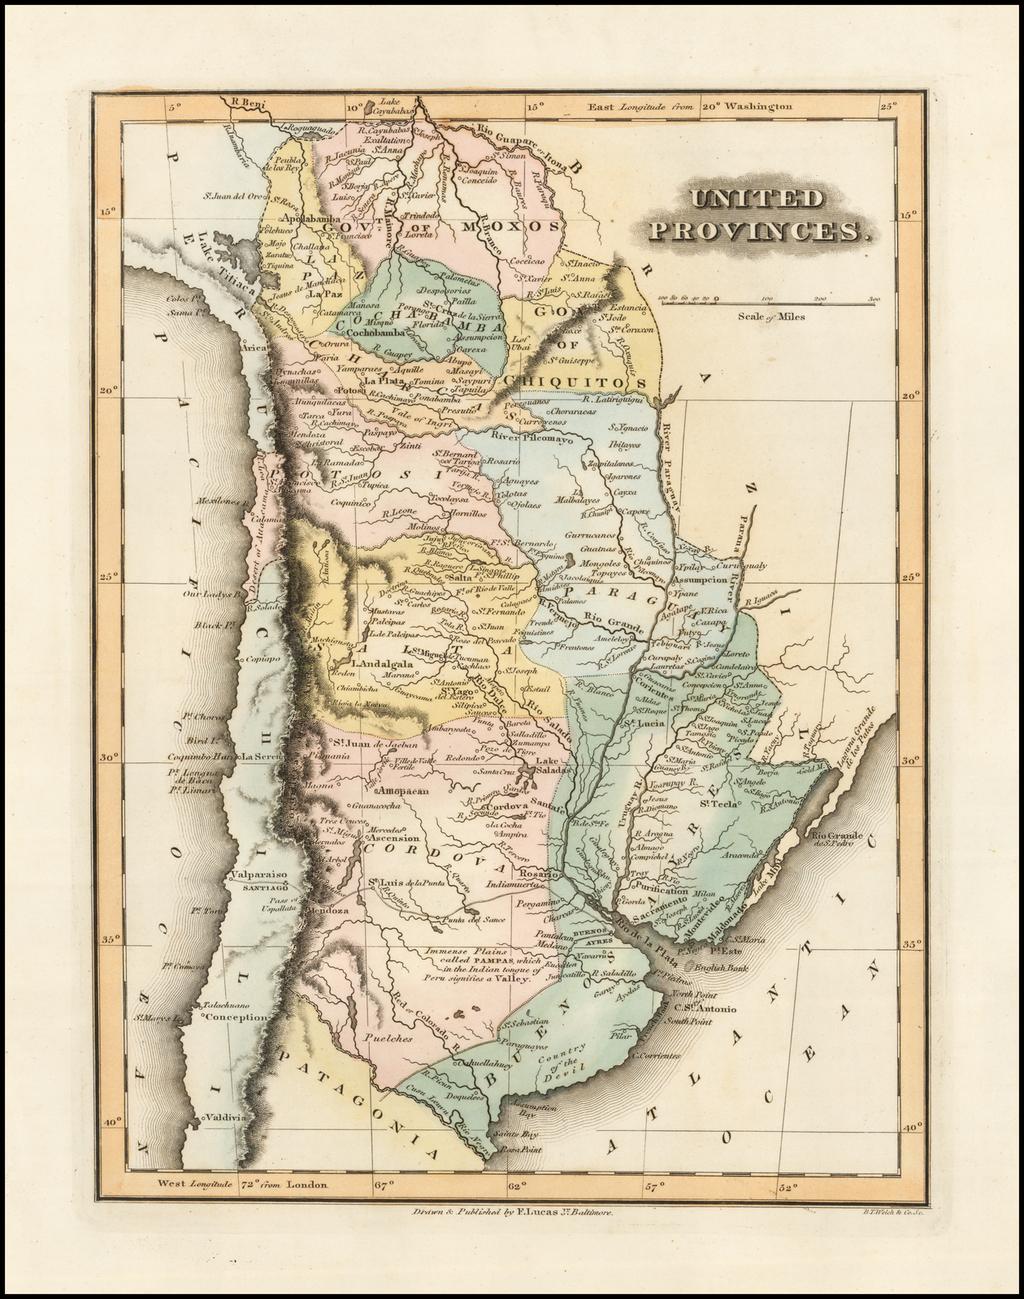 United Provinces (Argentina) By Fielding Lucas Jr.